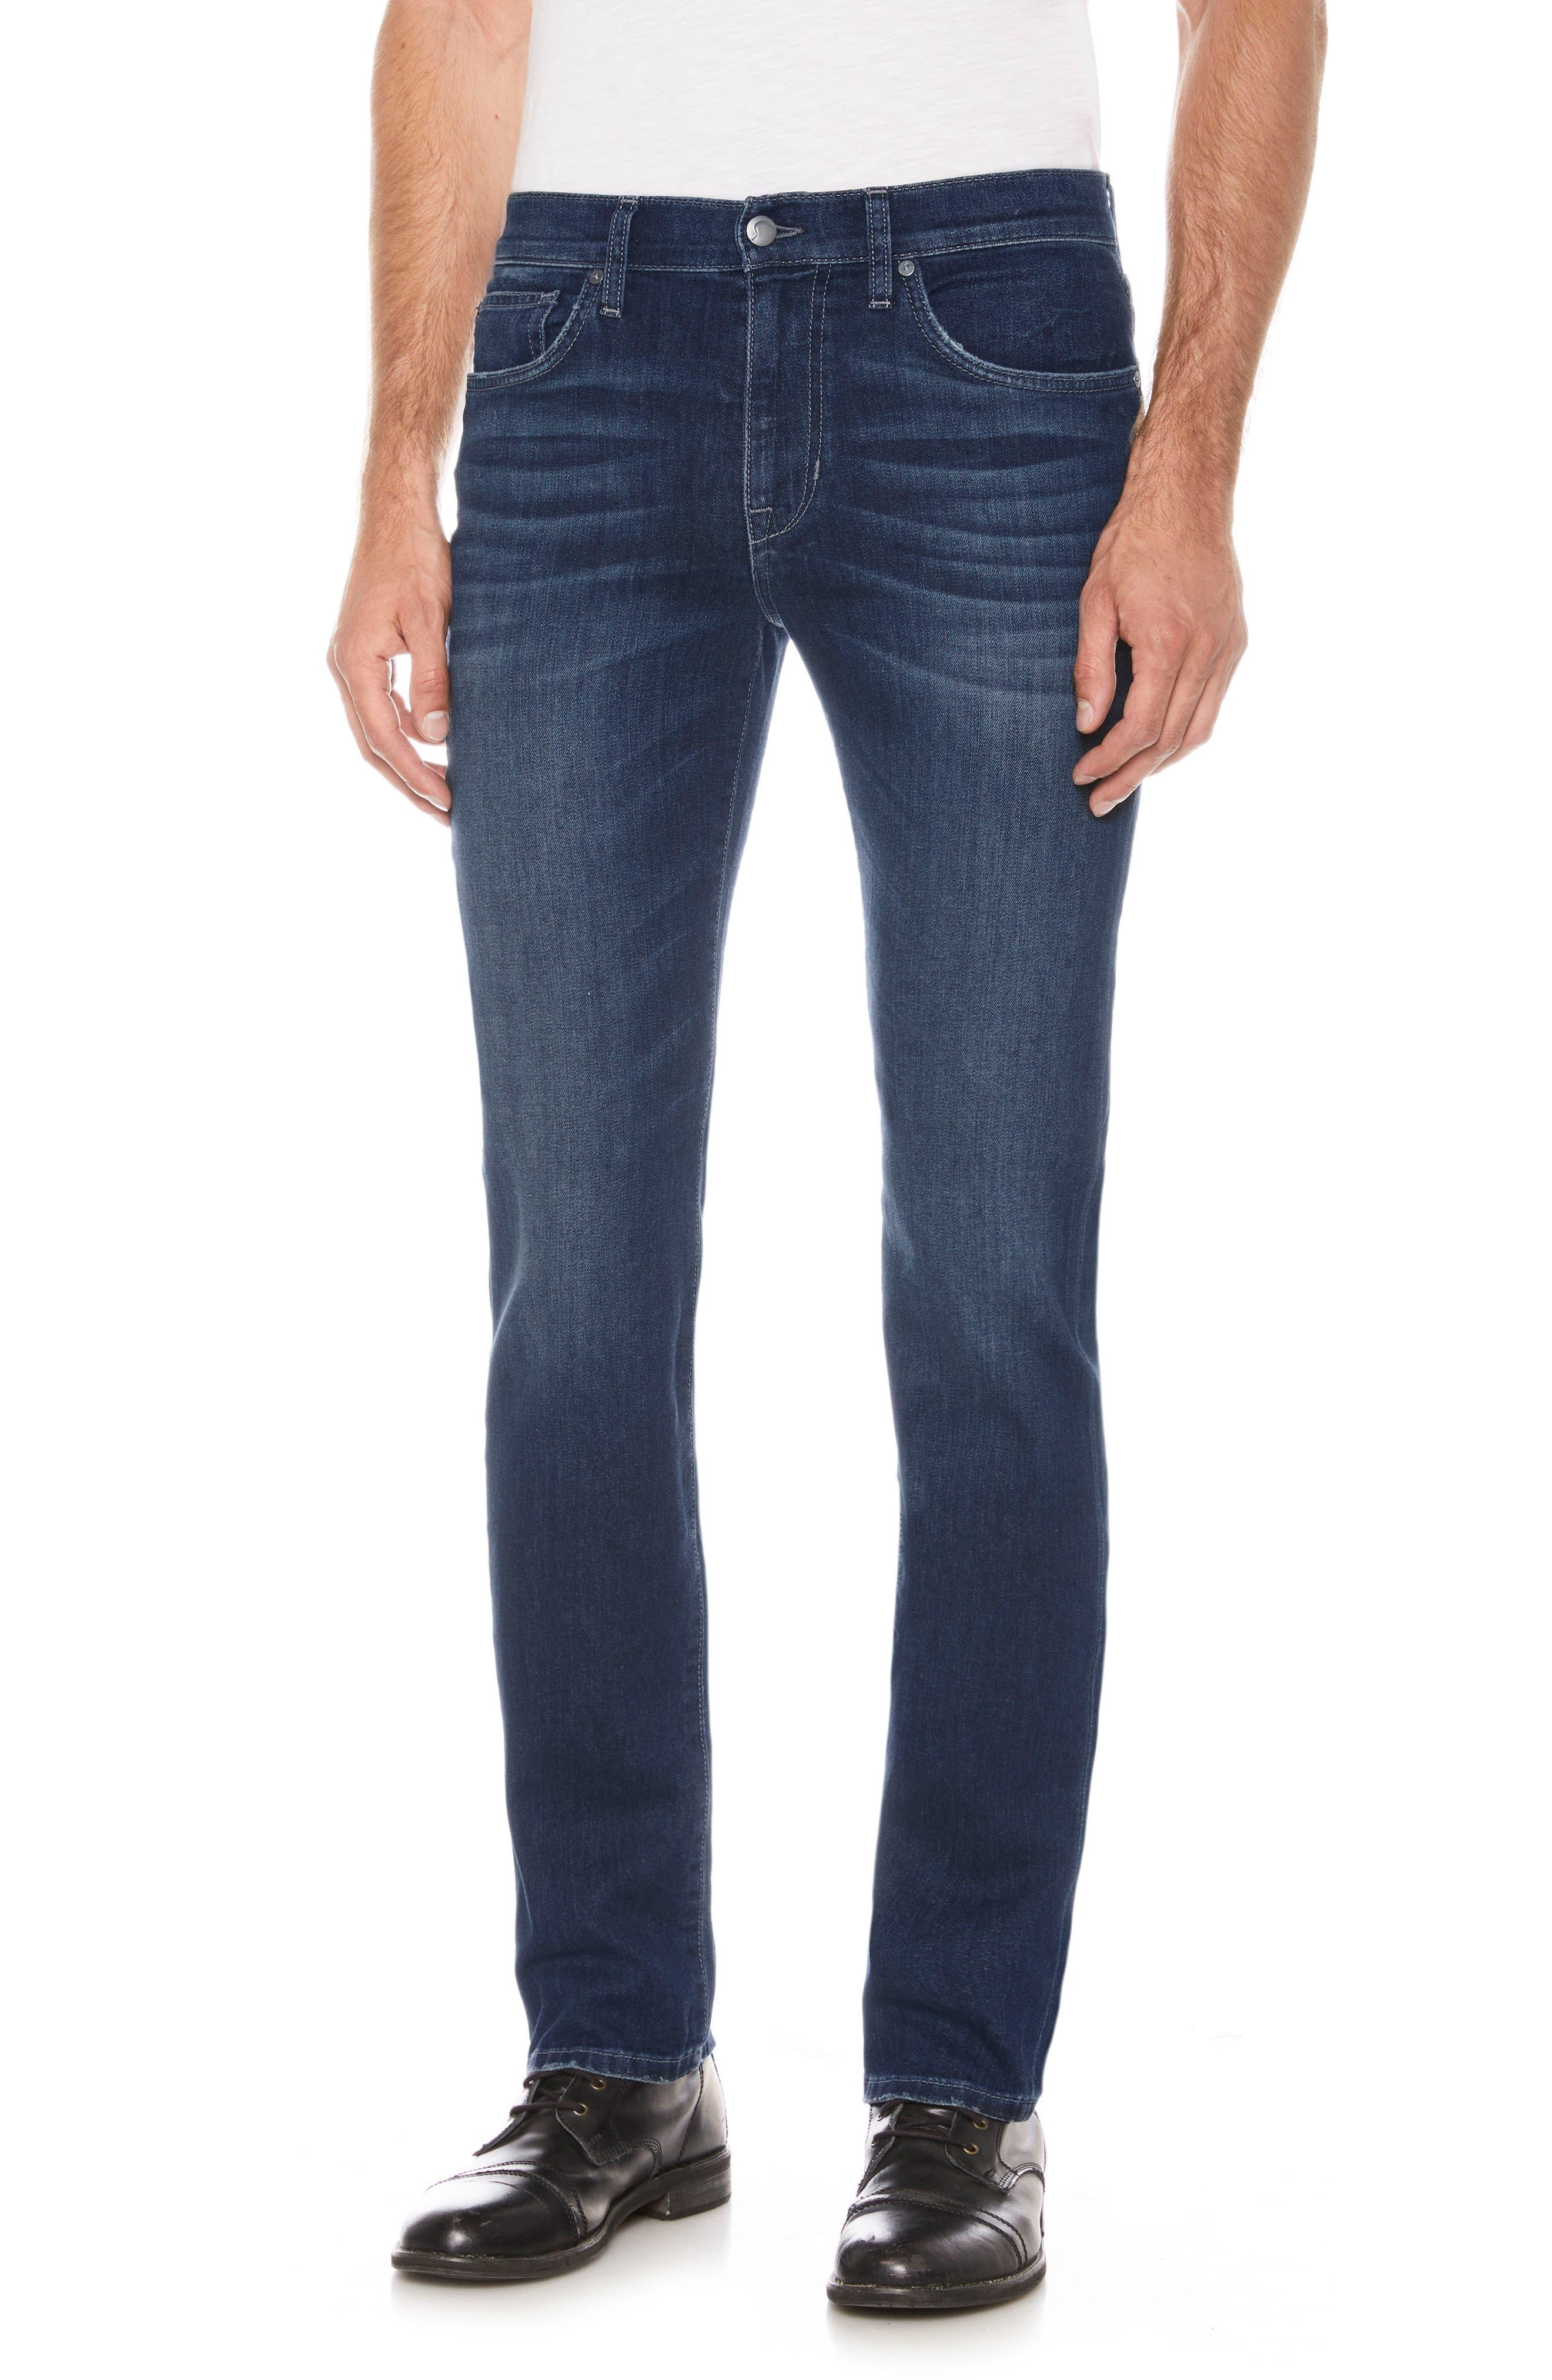 Brixton Slim Straight Leg Jeans,                             Main thumbnail 1, color,                             SANDERS